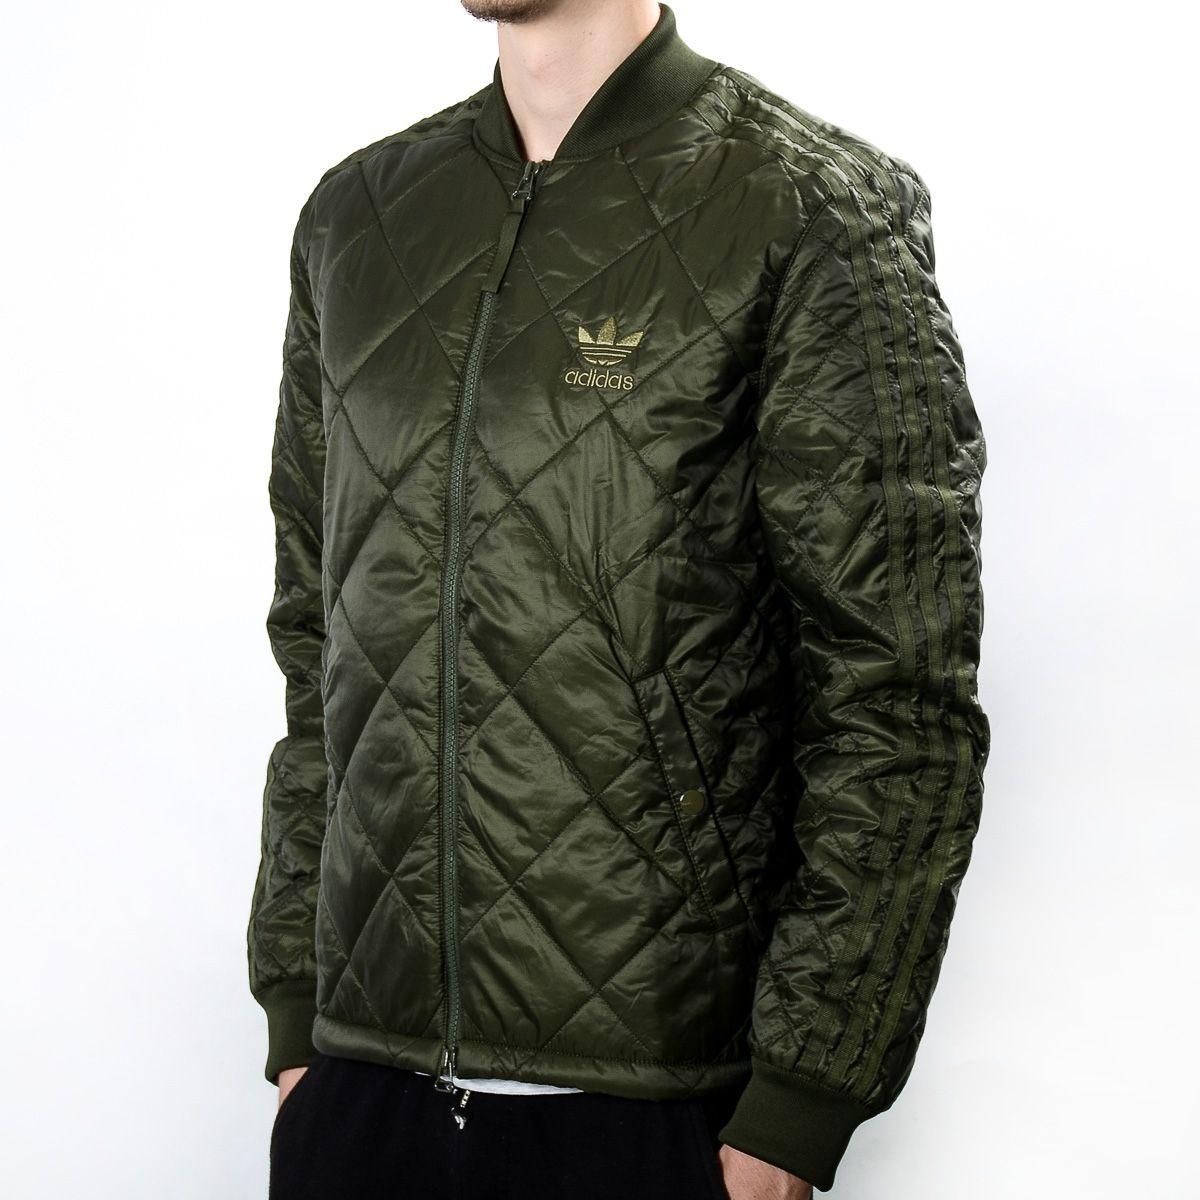 Adidas Originals Quilt.Type Jackets Adidas Originals Quilted Superstar Jacket